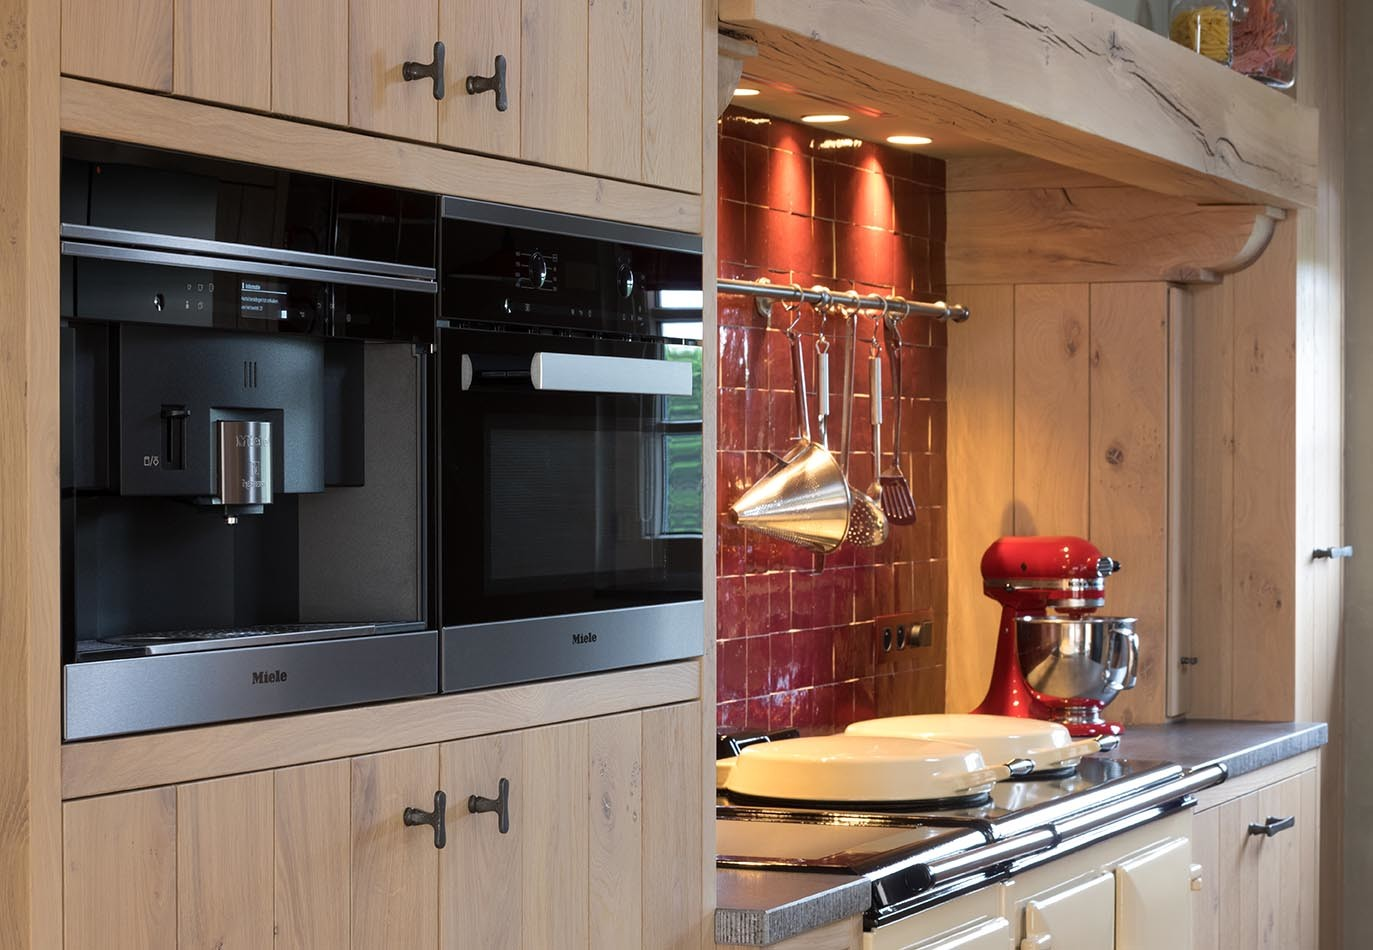 Moderne Retro Keuken : Keukenstijlen wat spreekt u aan bekijk diverse stijlen db keukens